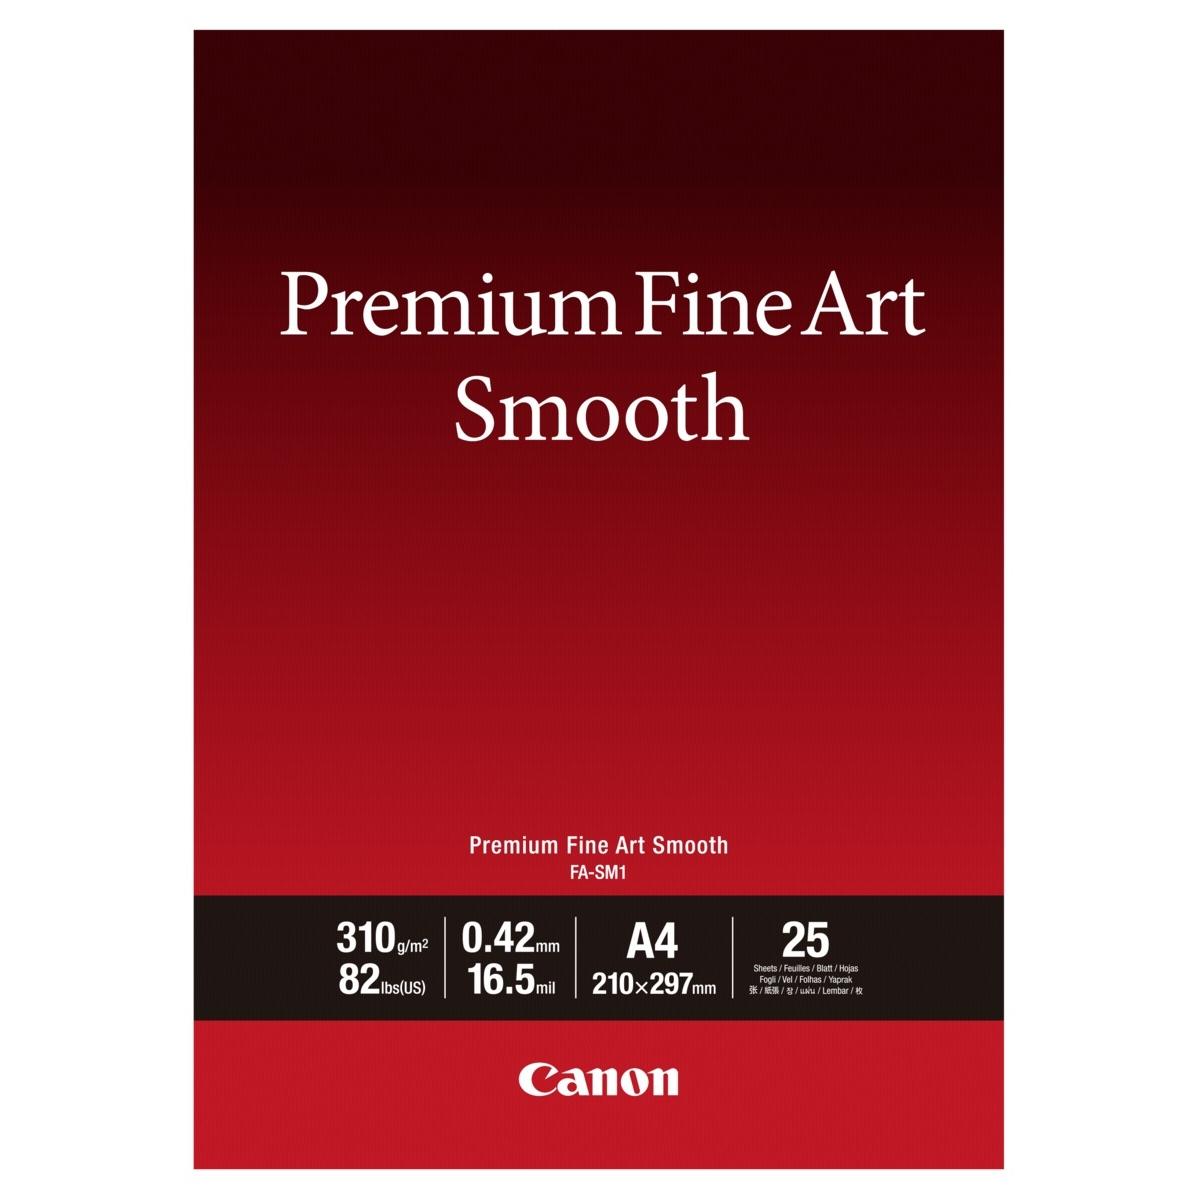 Original Canon FA-SM1 310gsm Premium Fine Art Smooth A4 Cotton Matte Photo Paper - 25 Sheets (1711C001)